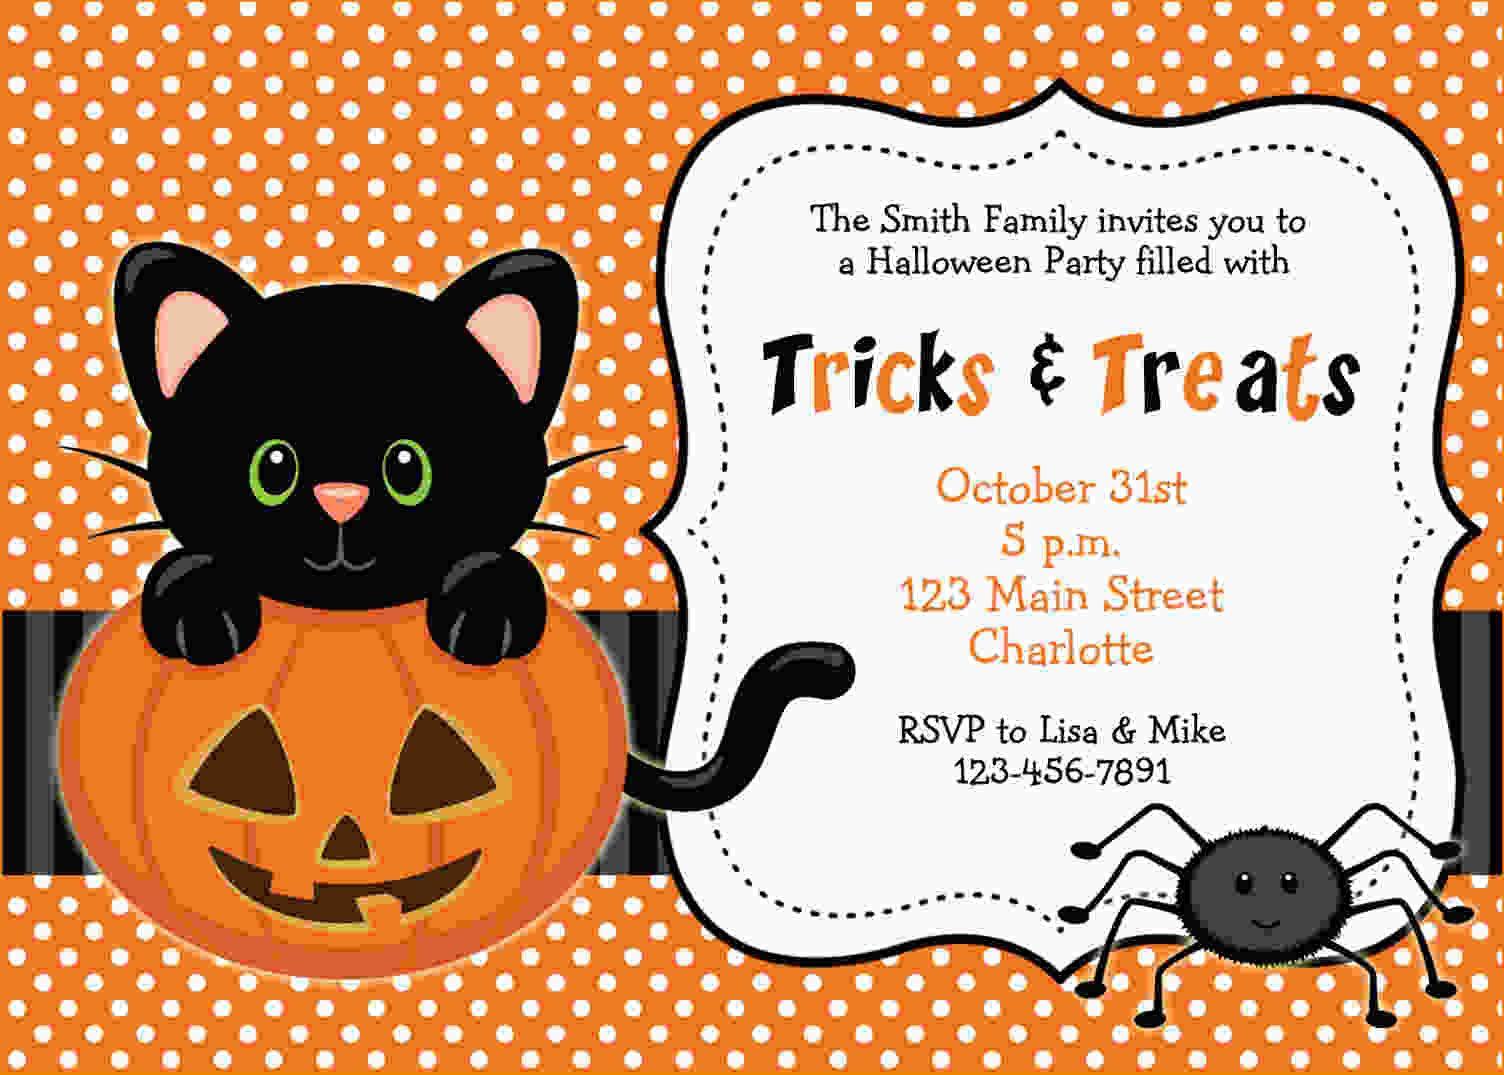 Free Printable Halloween Invitations   Free Printable Birthday - Free Printable Halloween Invitations